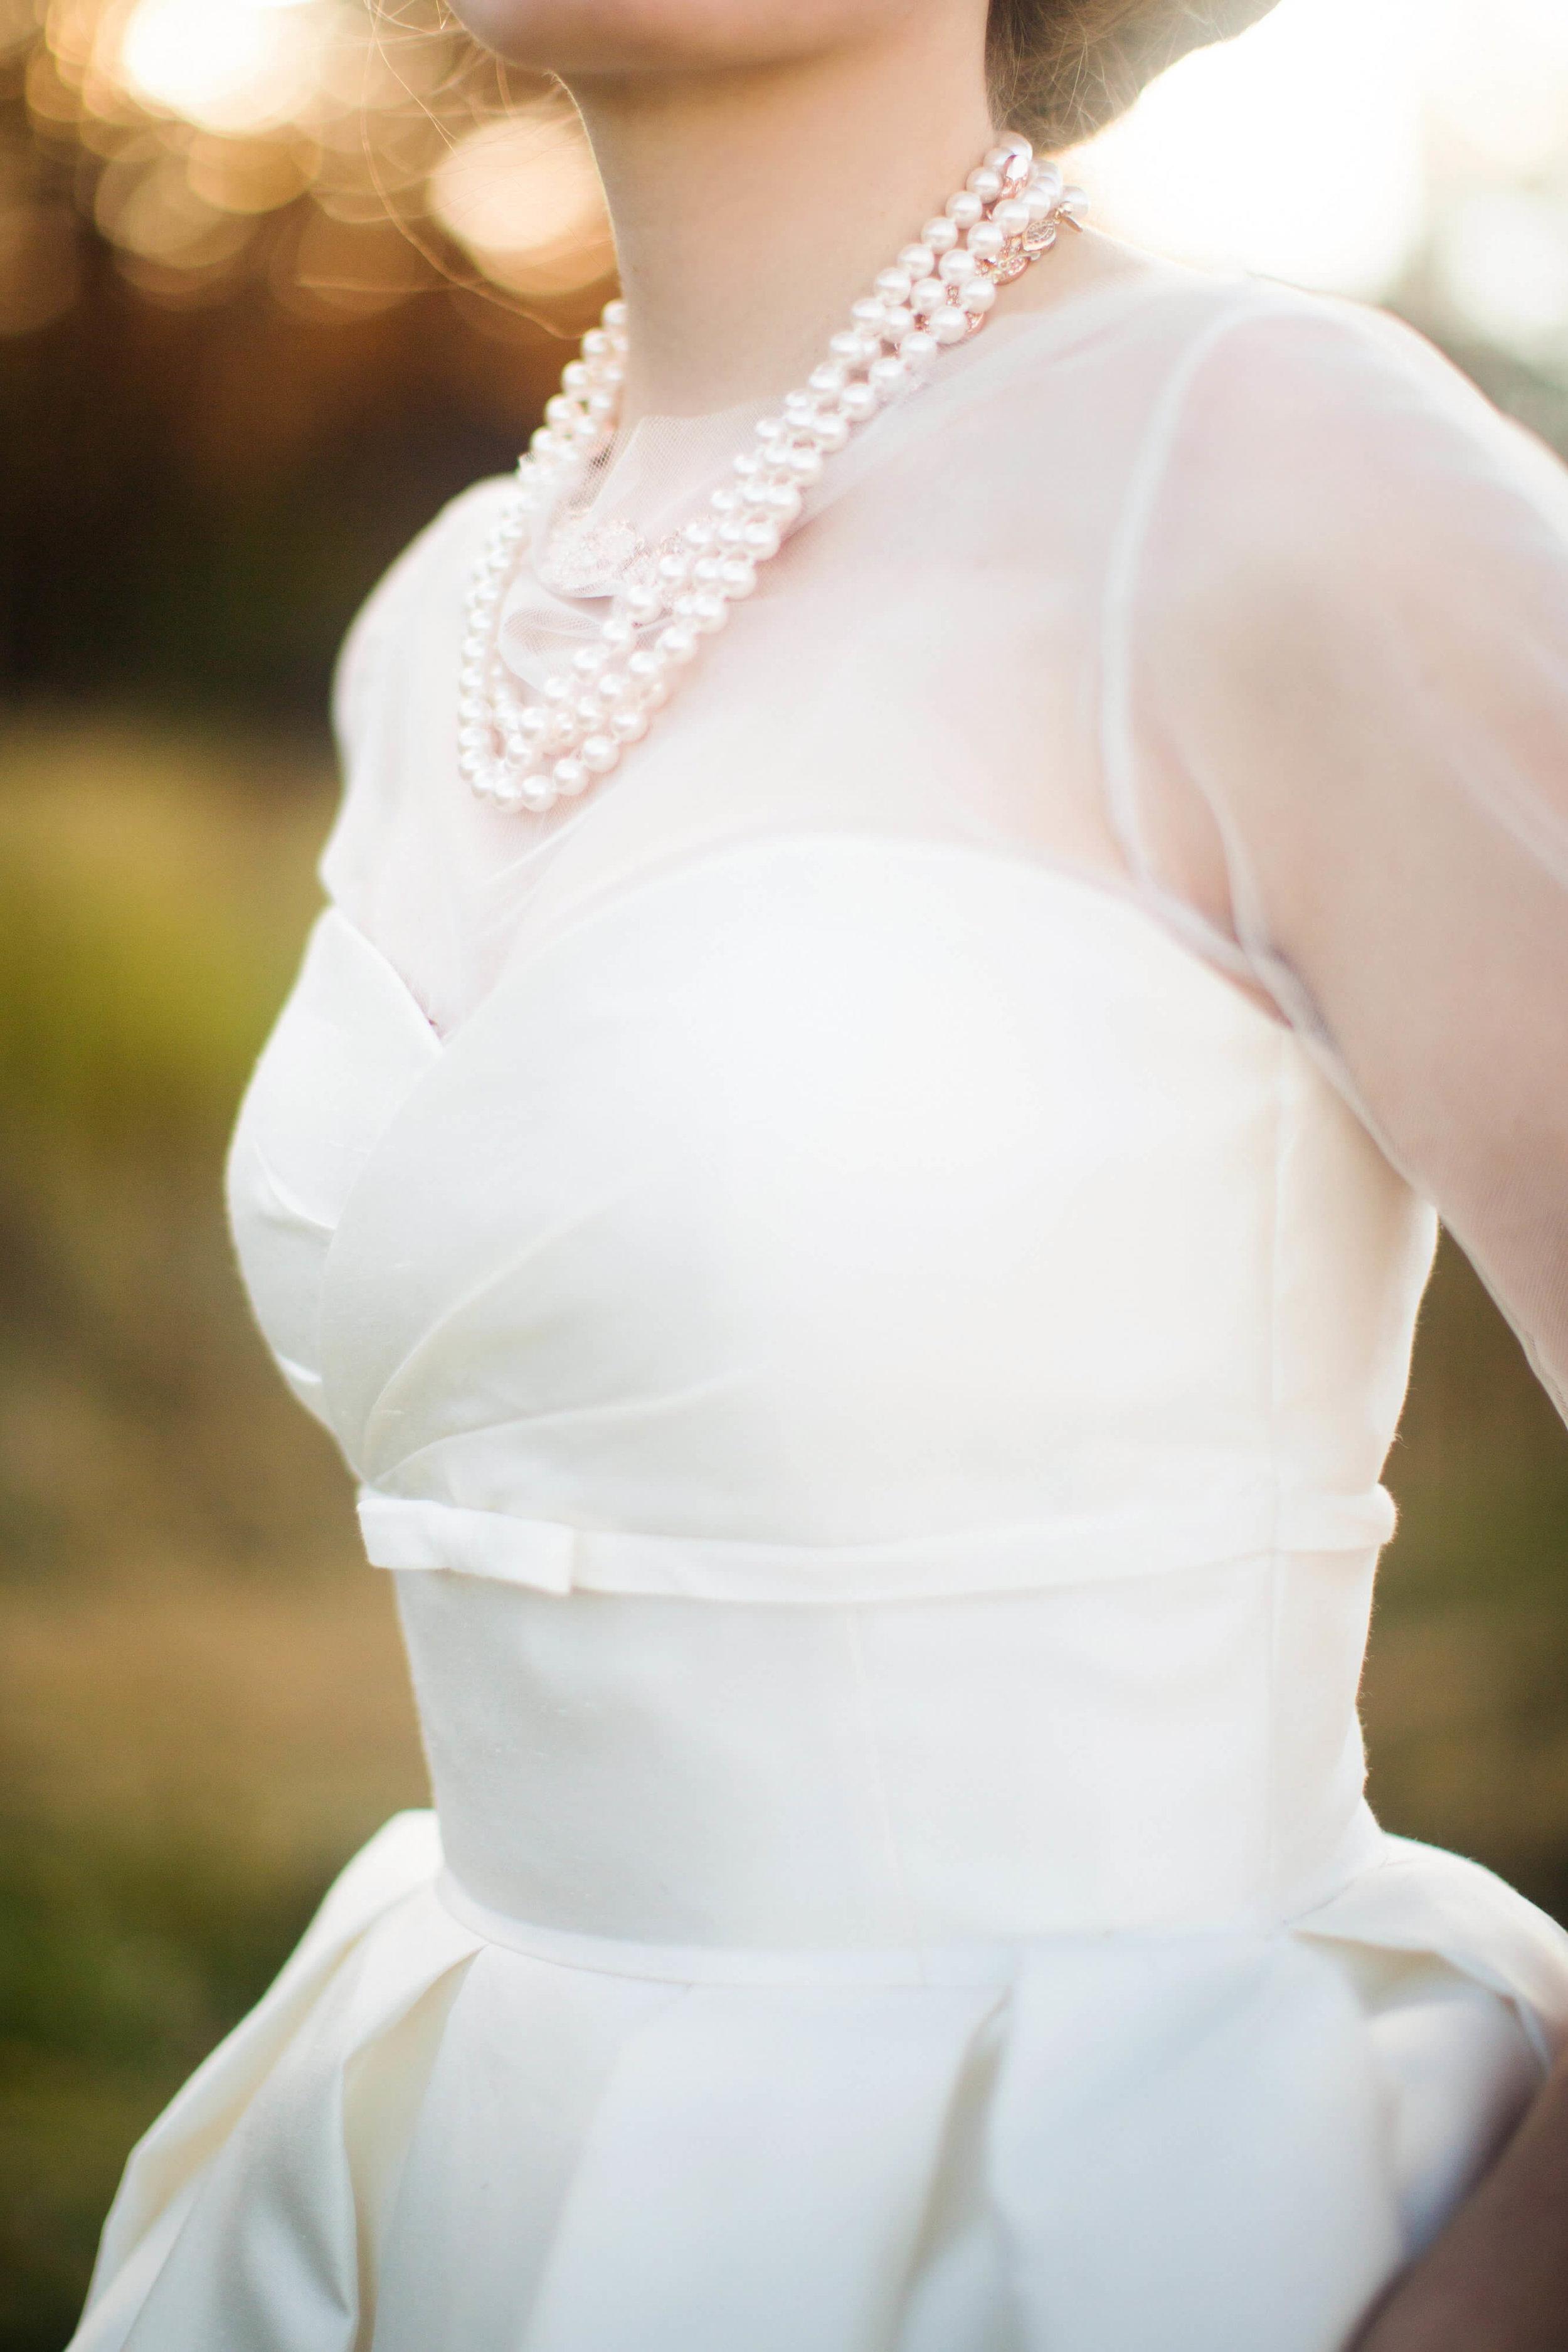 bride in pearls | Minnesota wedding photographer Studio KH wedding dress details | wedding blog | Sixpence Events 70 Ways to Photograph Your Wedding Dress.jpg